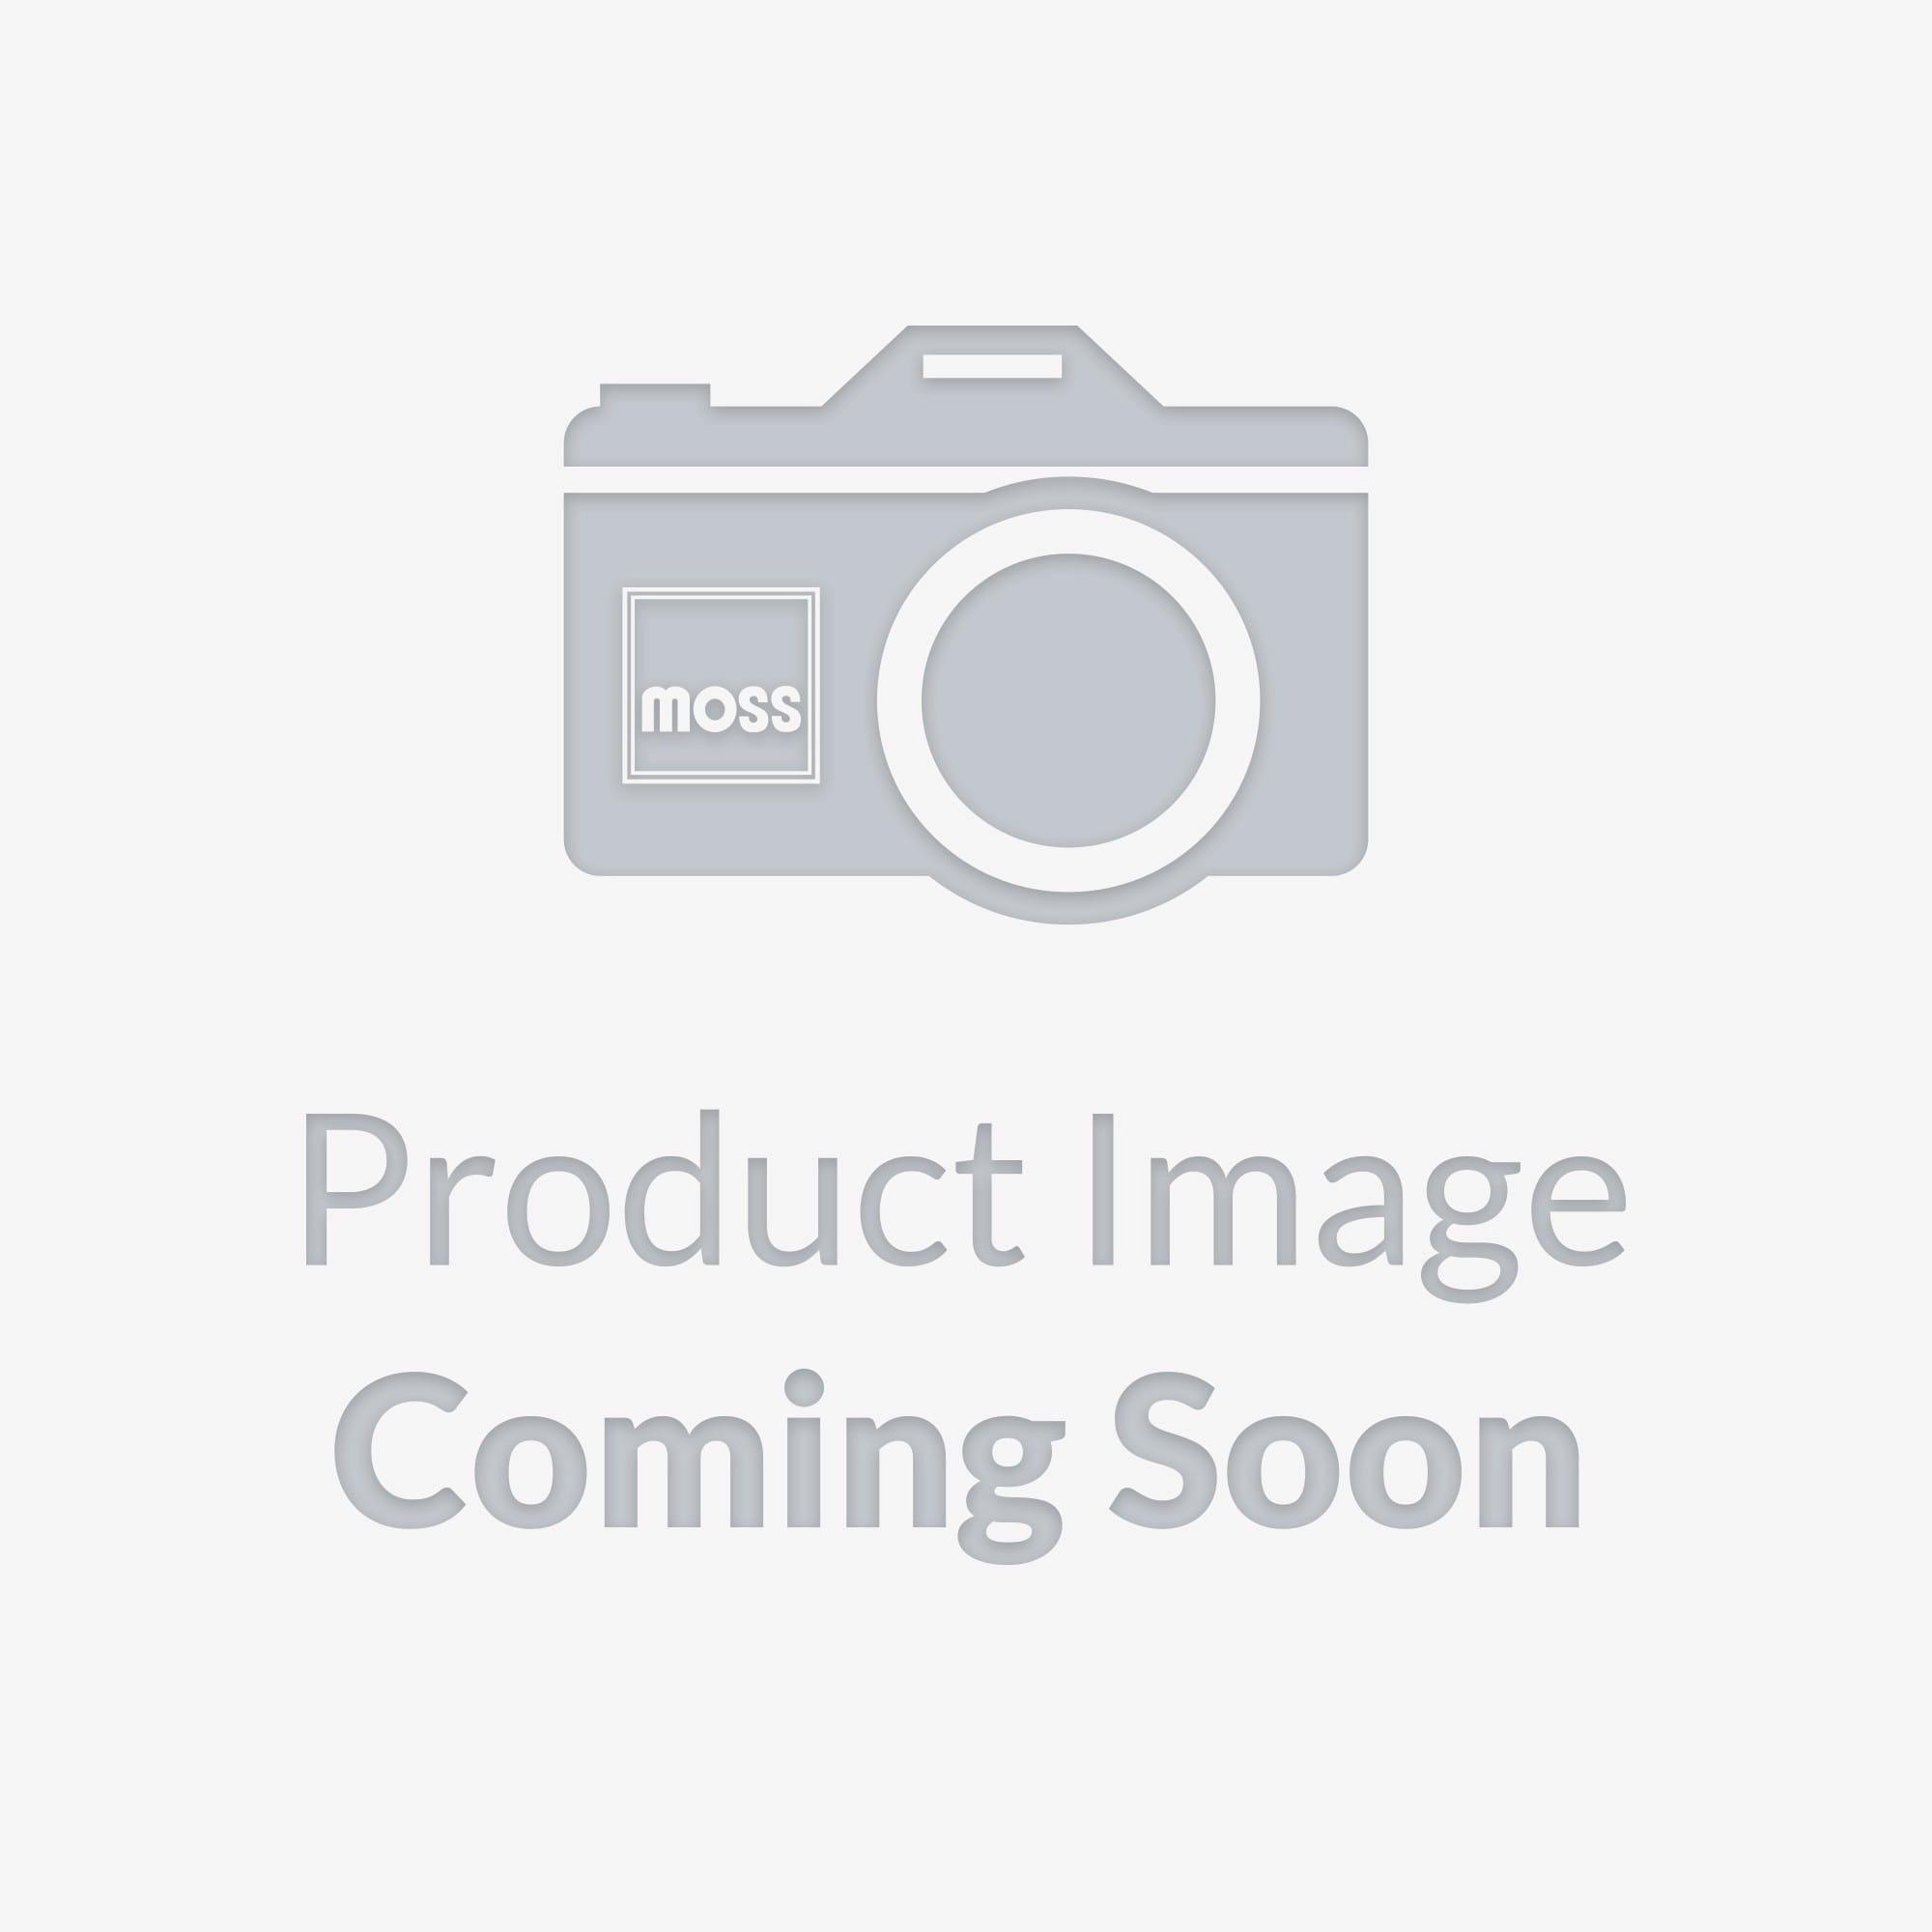 Led Bulbs For Cars >> LED Dash Bulbs - Dashboard - Triumph TR6, 250 | Moss Motors